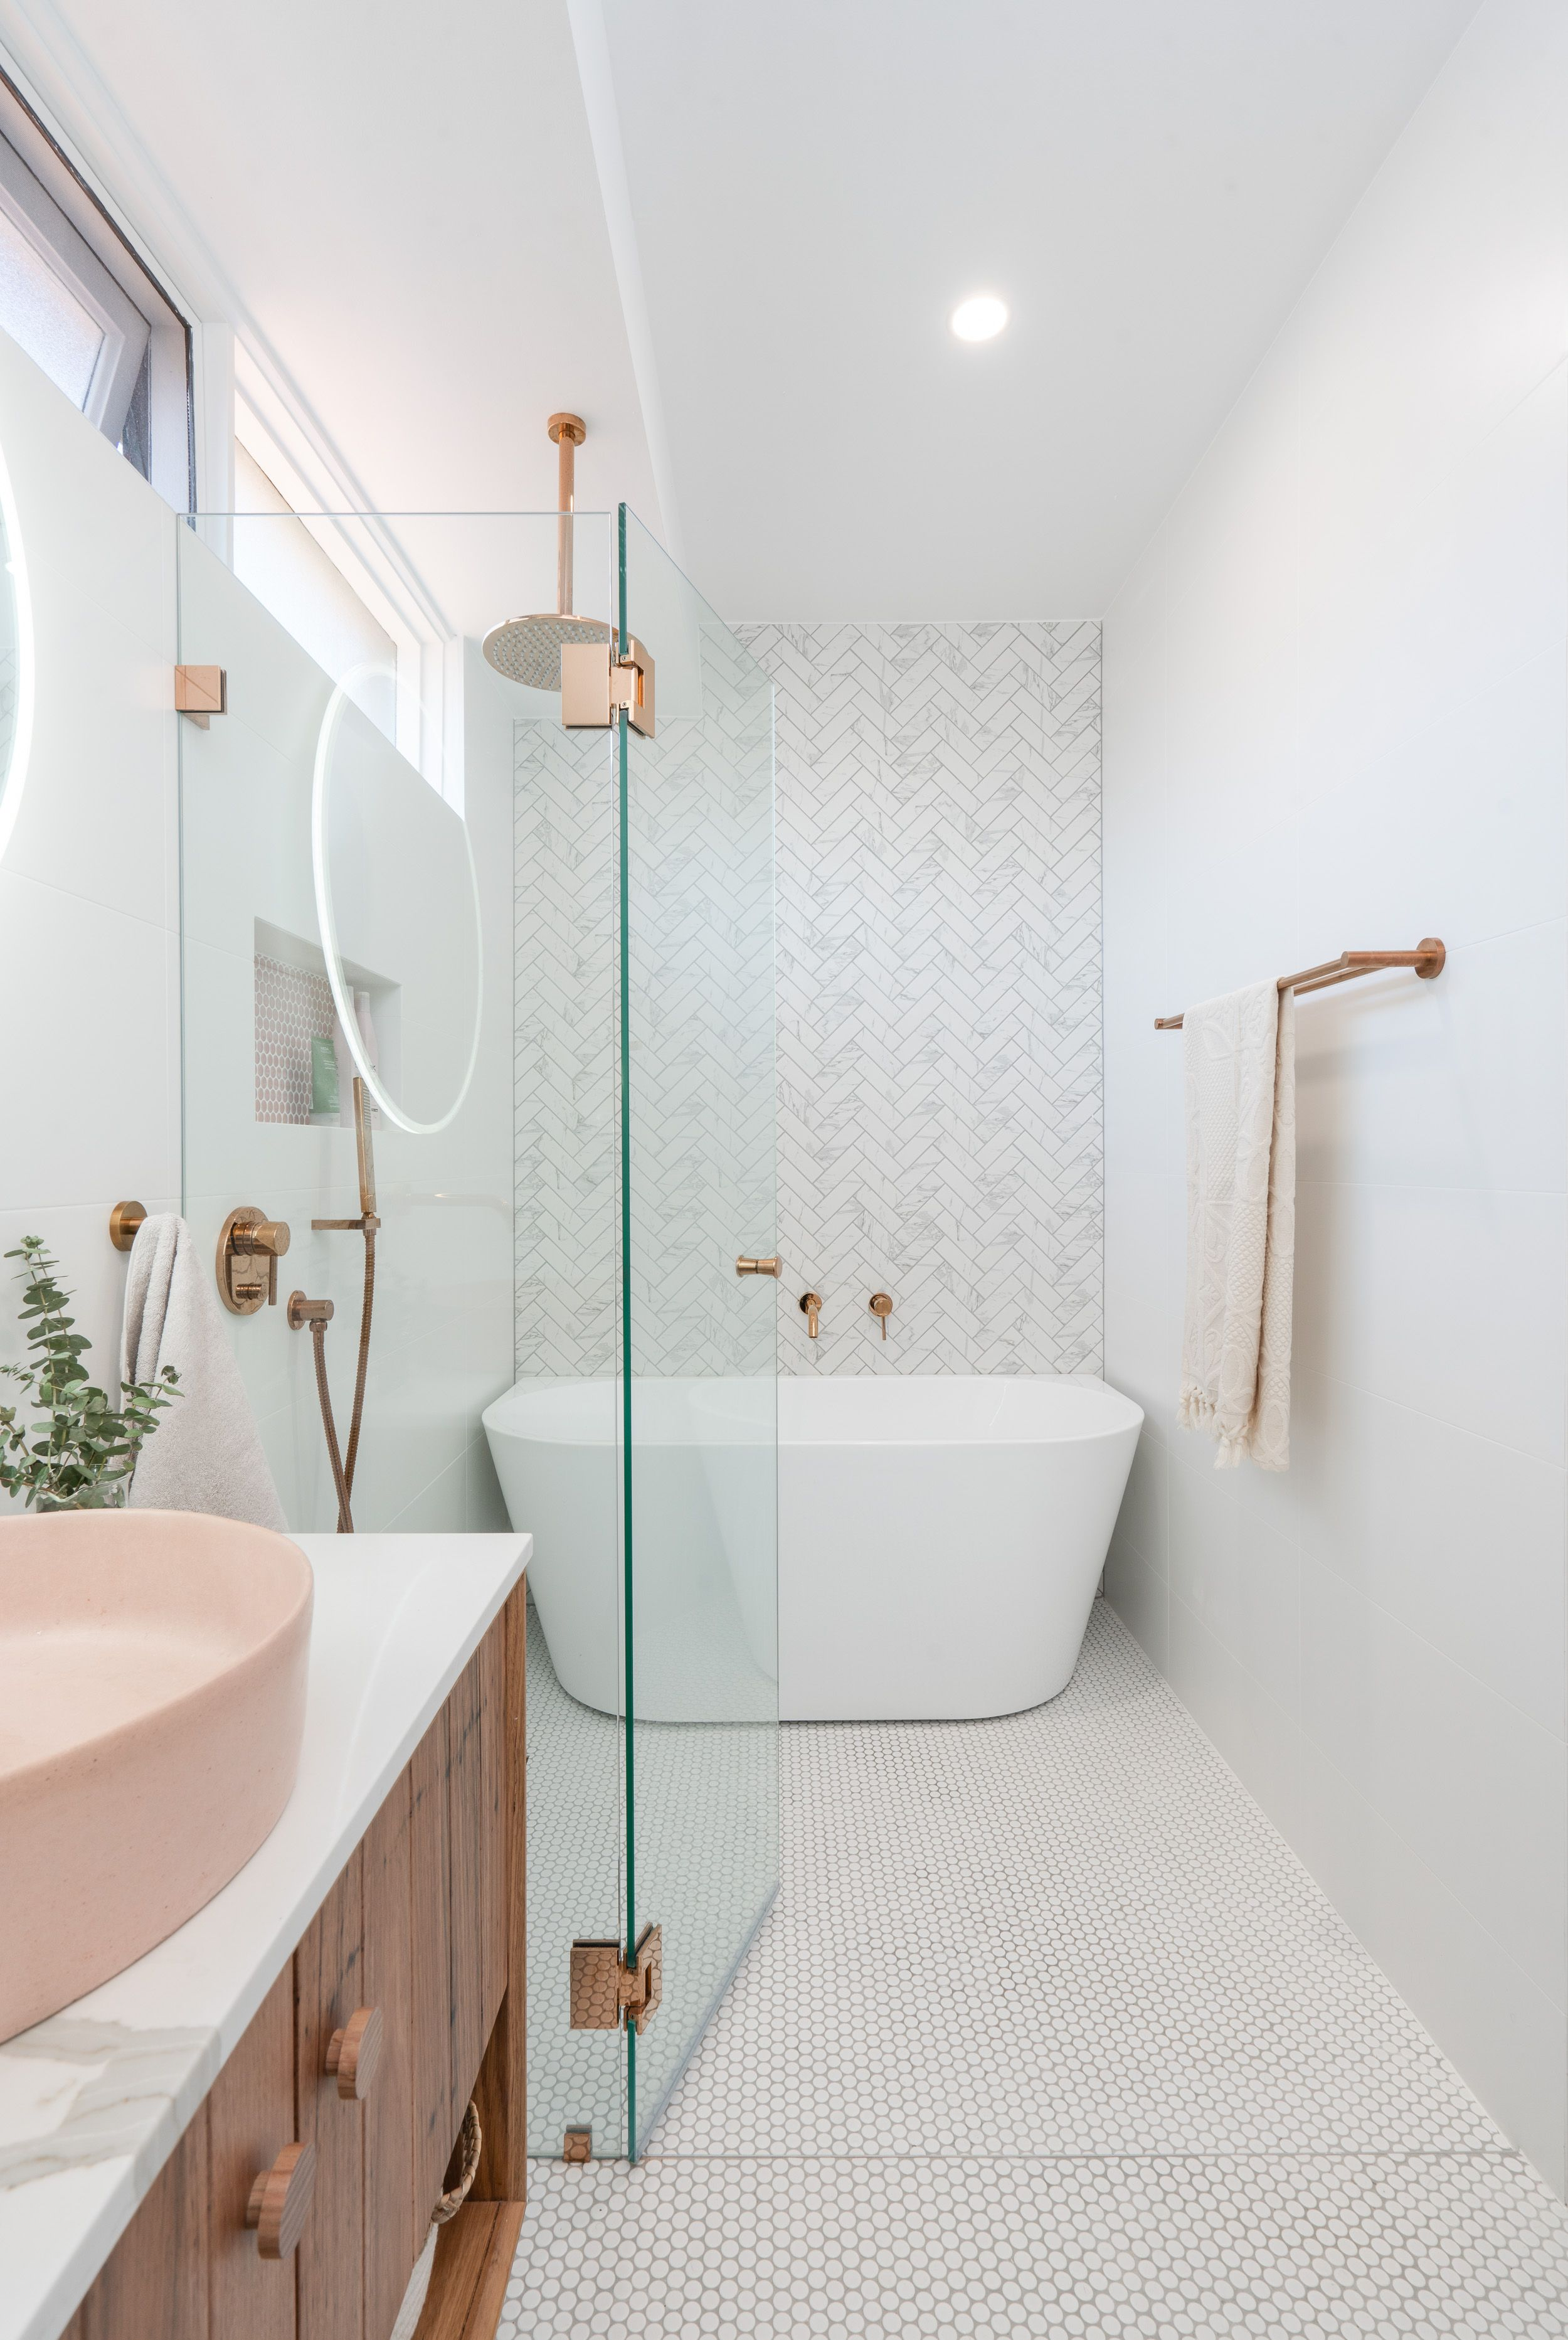 Blush Pink Bathroom Design Bathroom Interior Design Bathroom Design Bathroom Interior